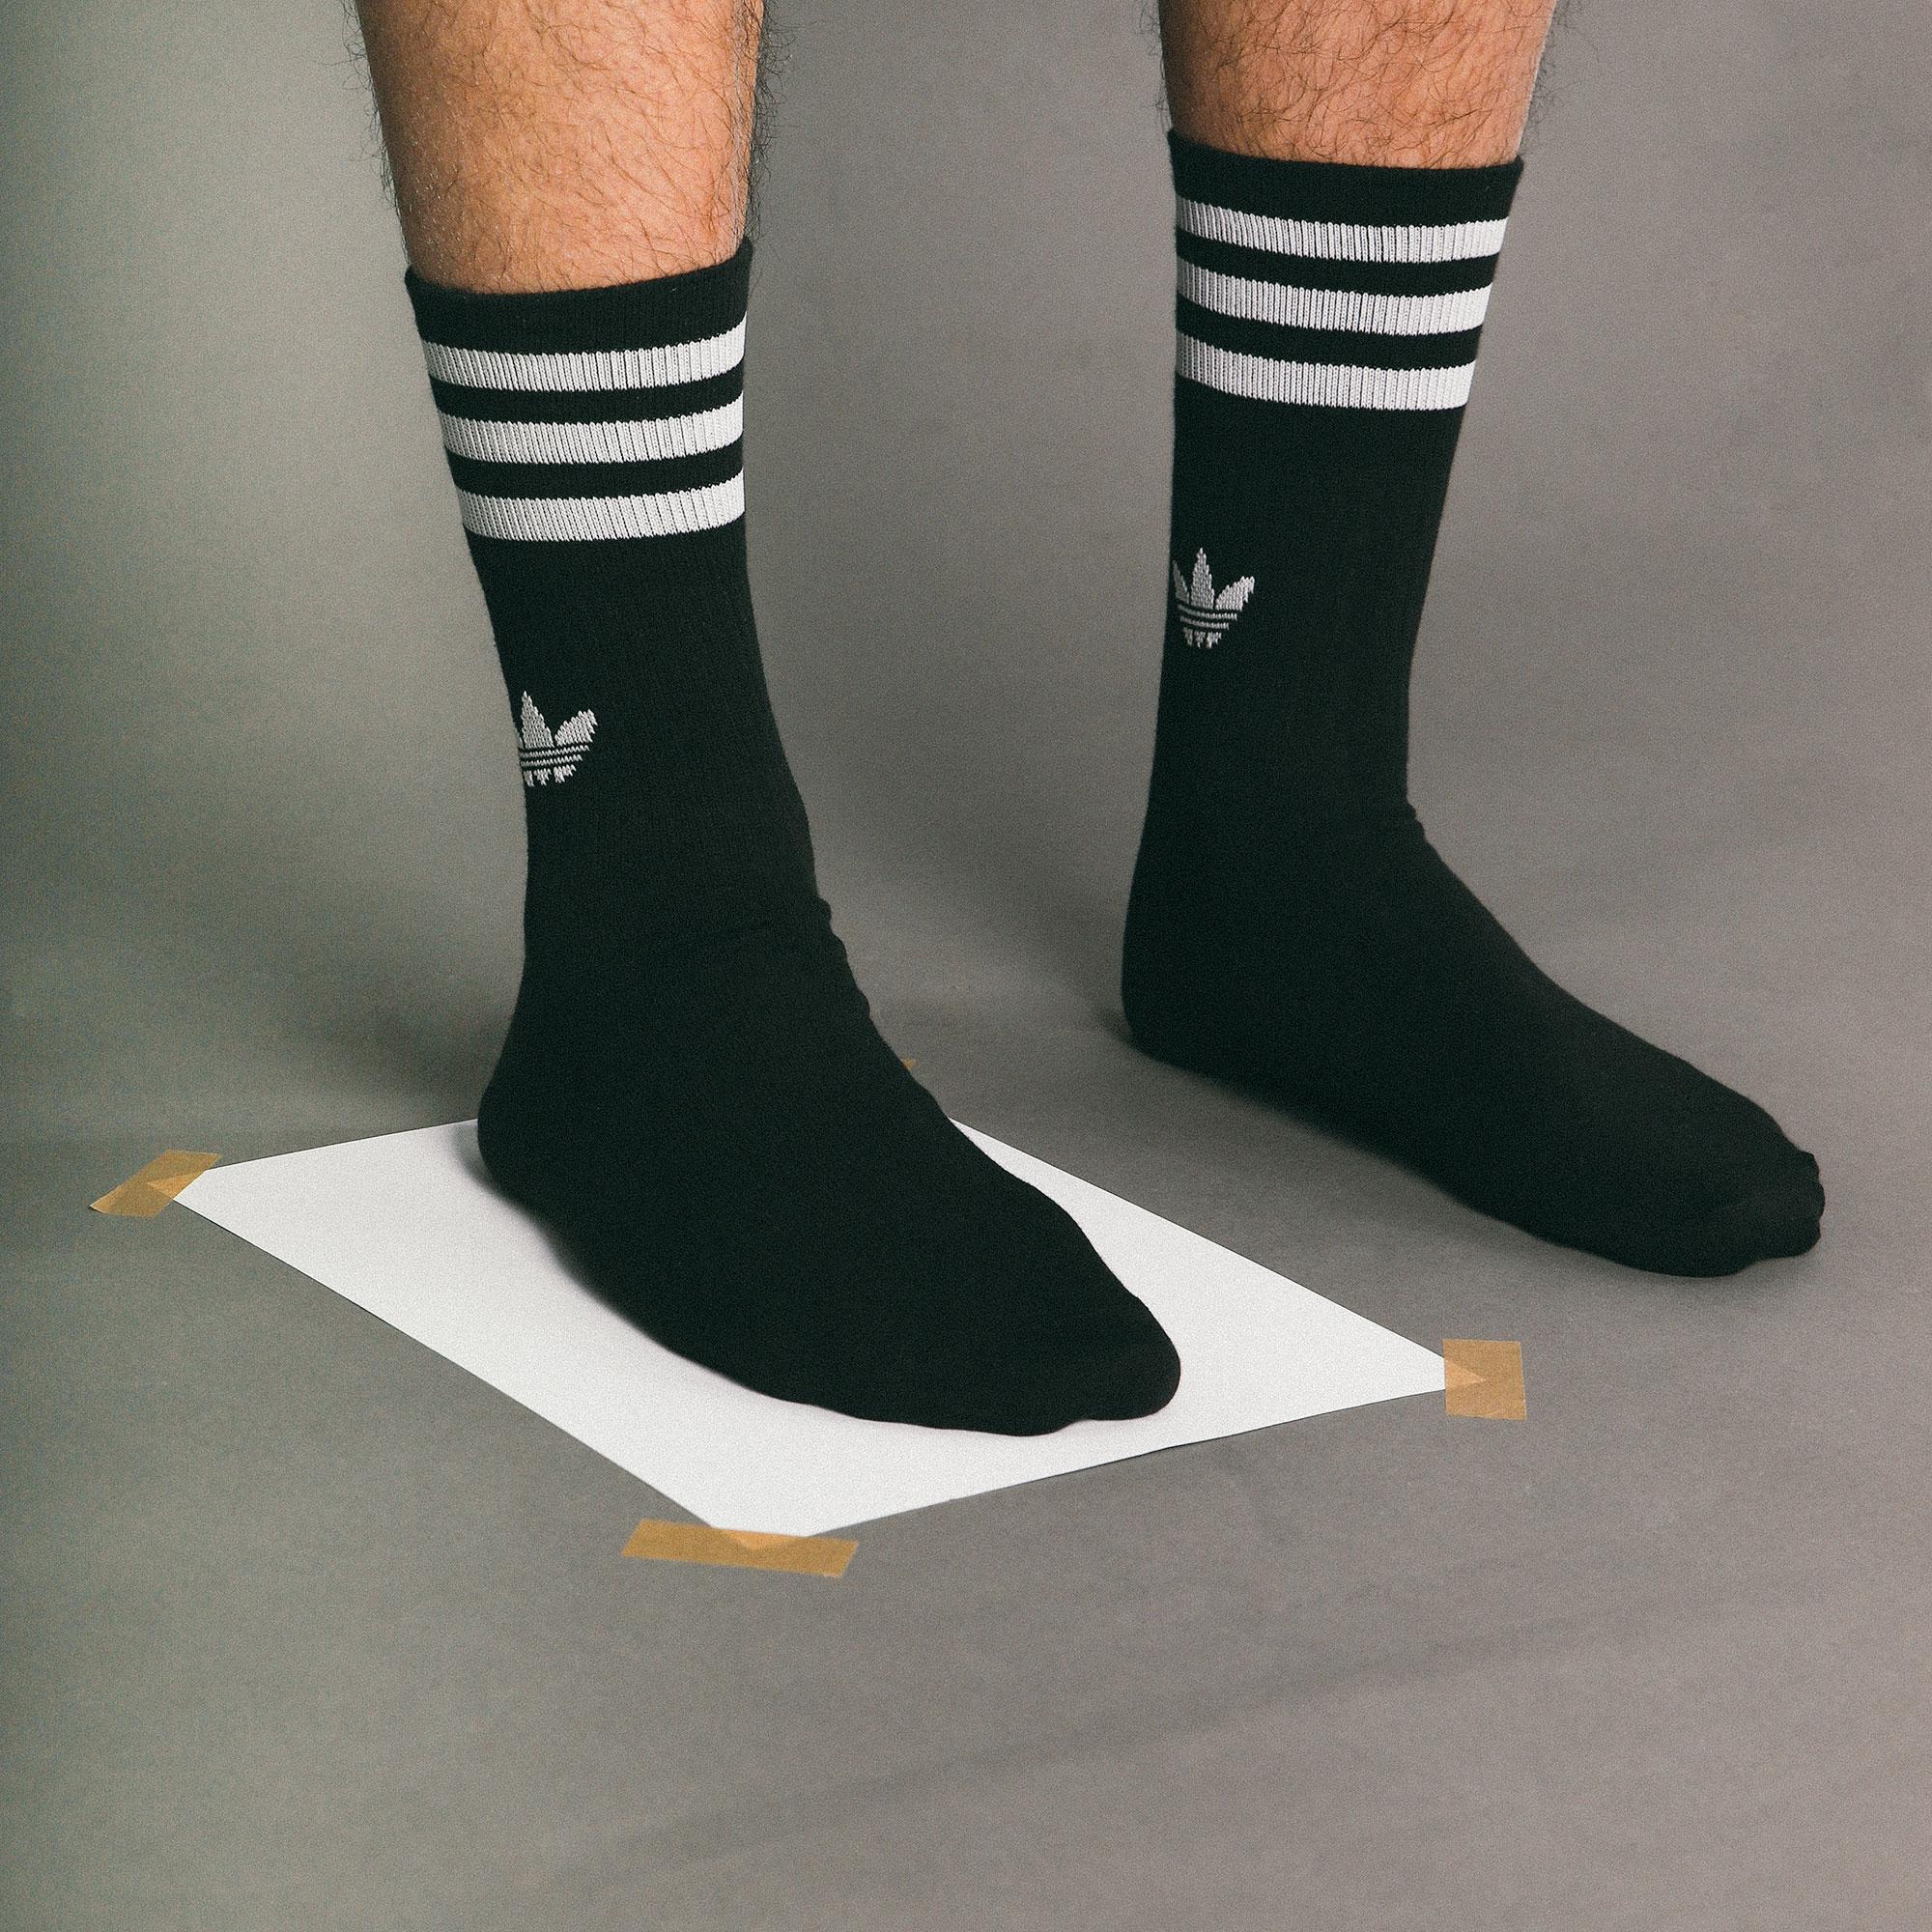 Sneaker sizeguide step 1